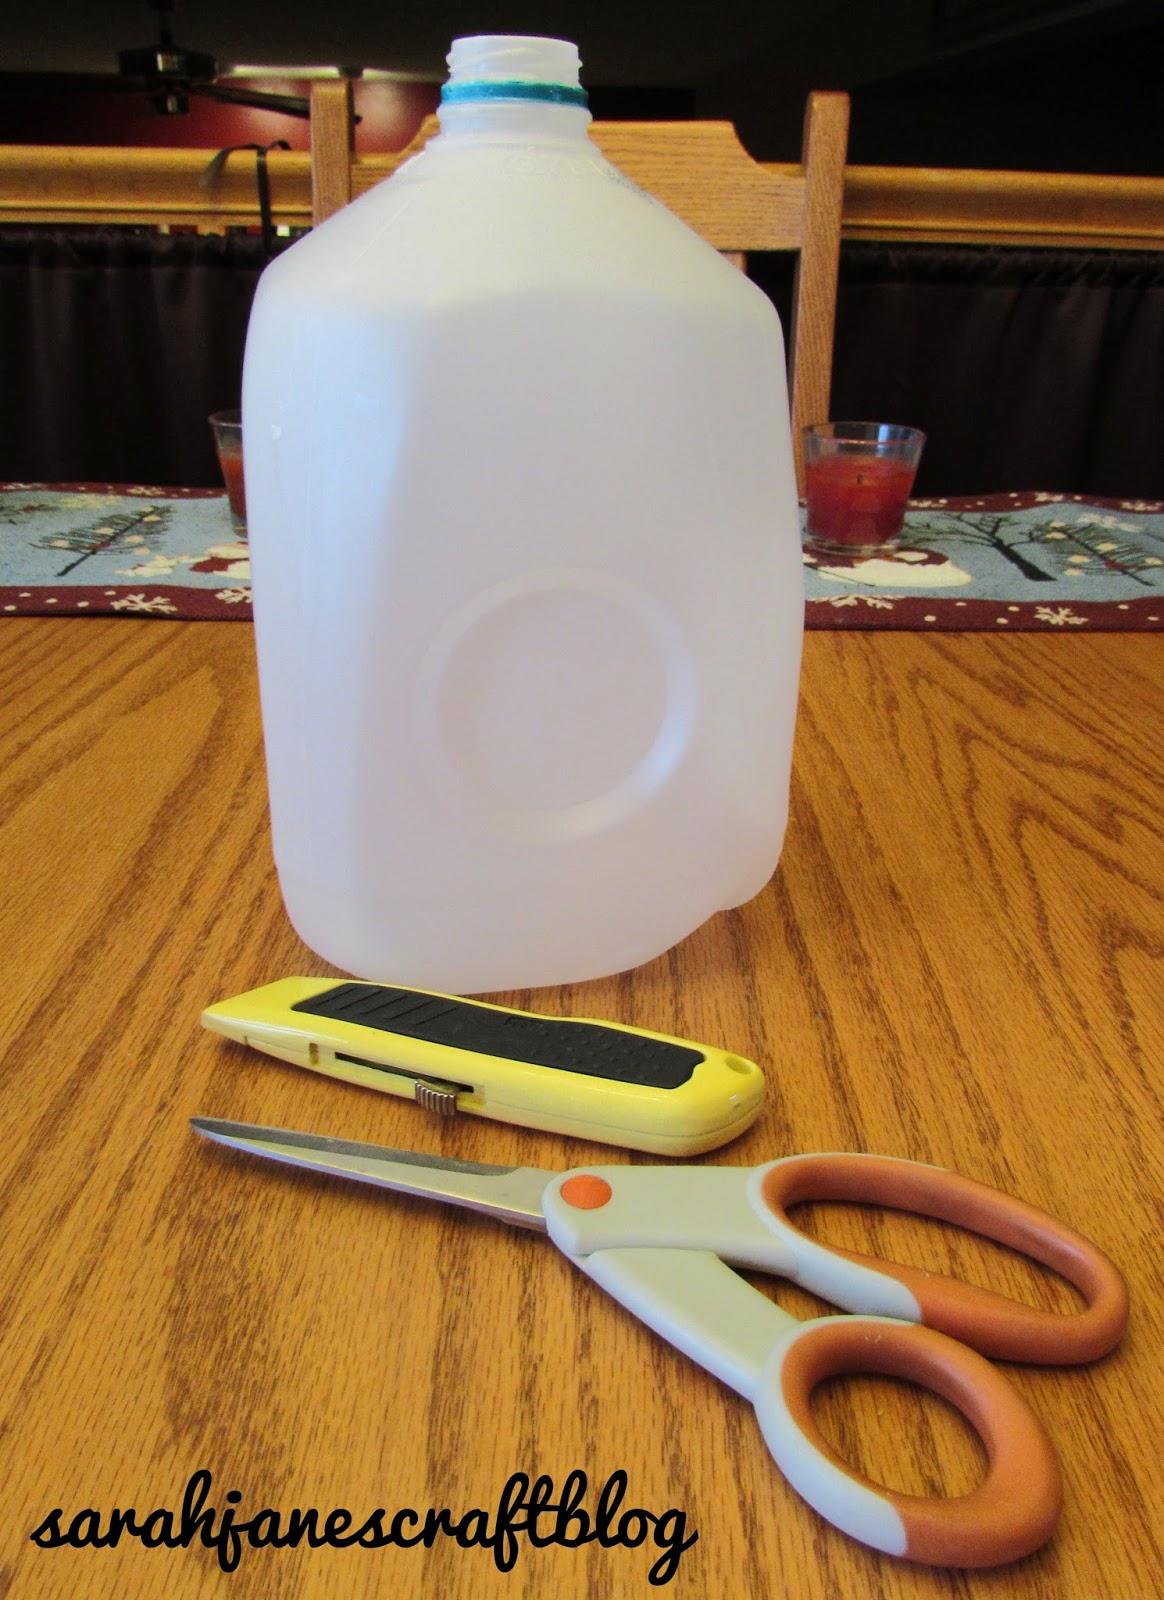 Sarah jane 39 s craft blog milk jug christmas ornaments for Christmas crafts with milk jugs